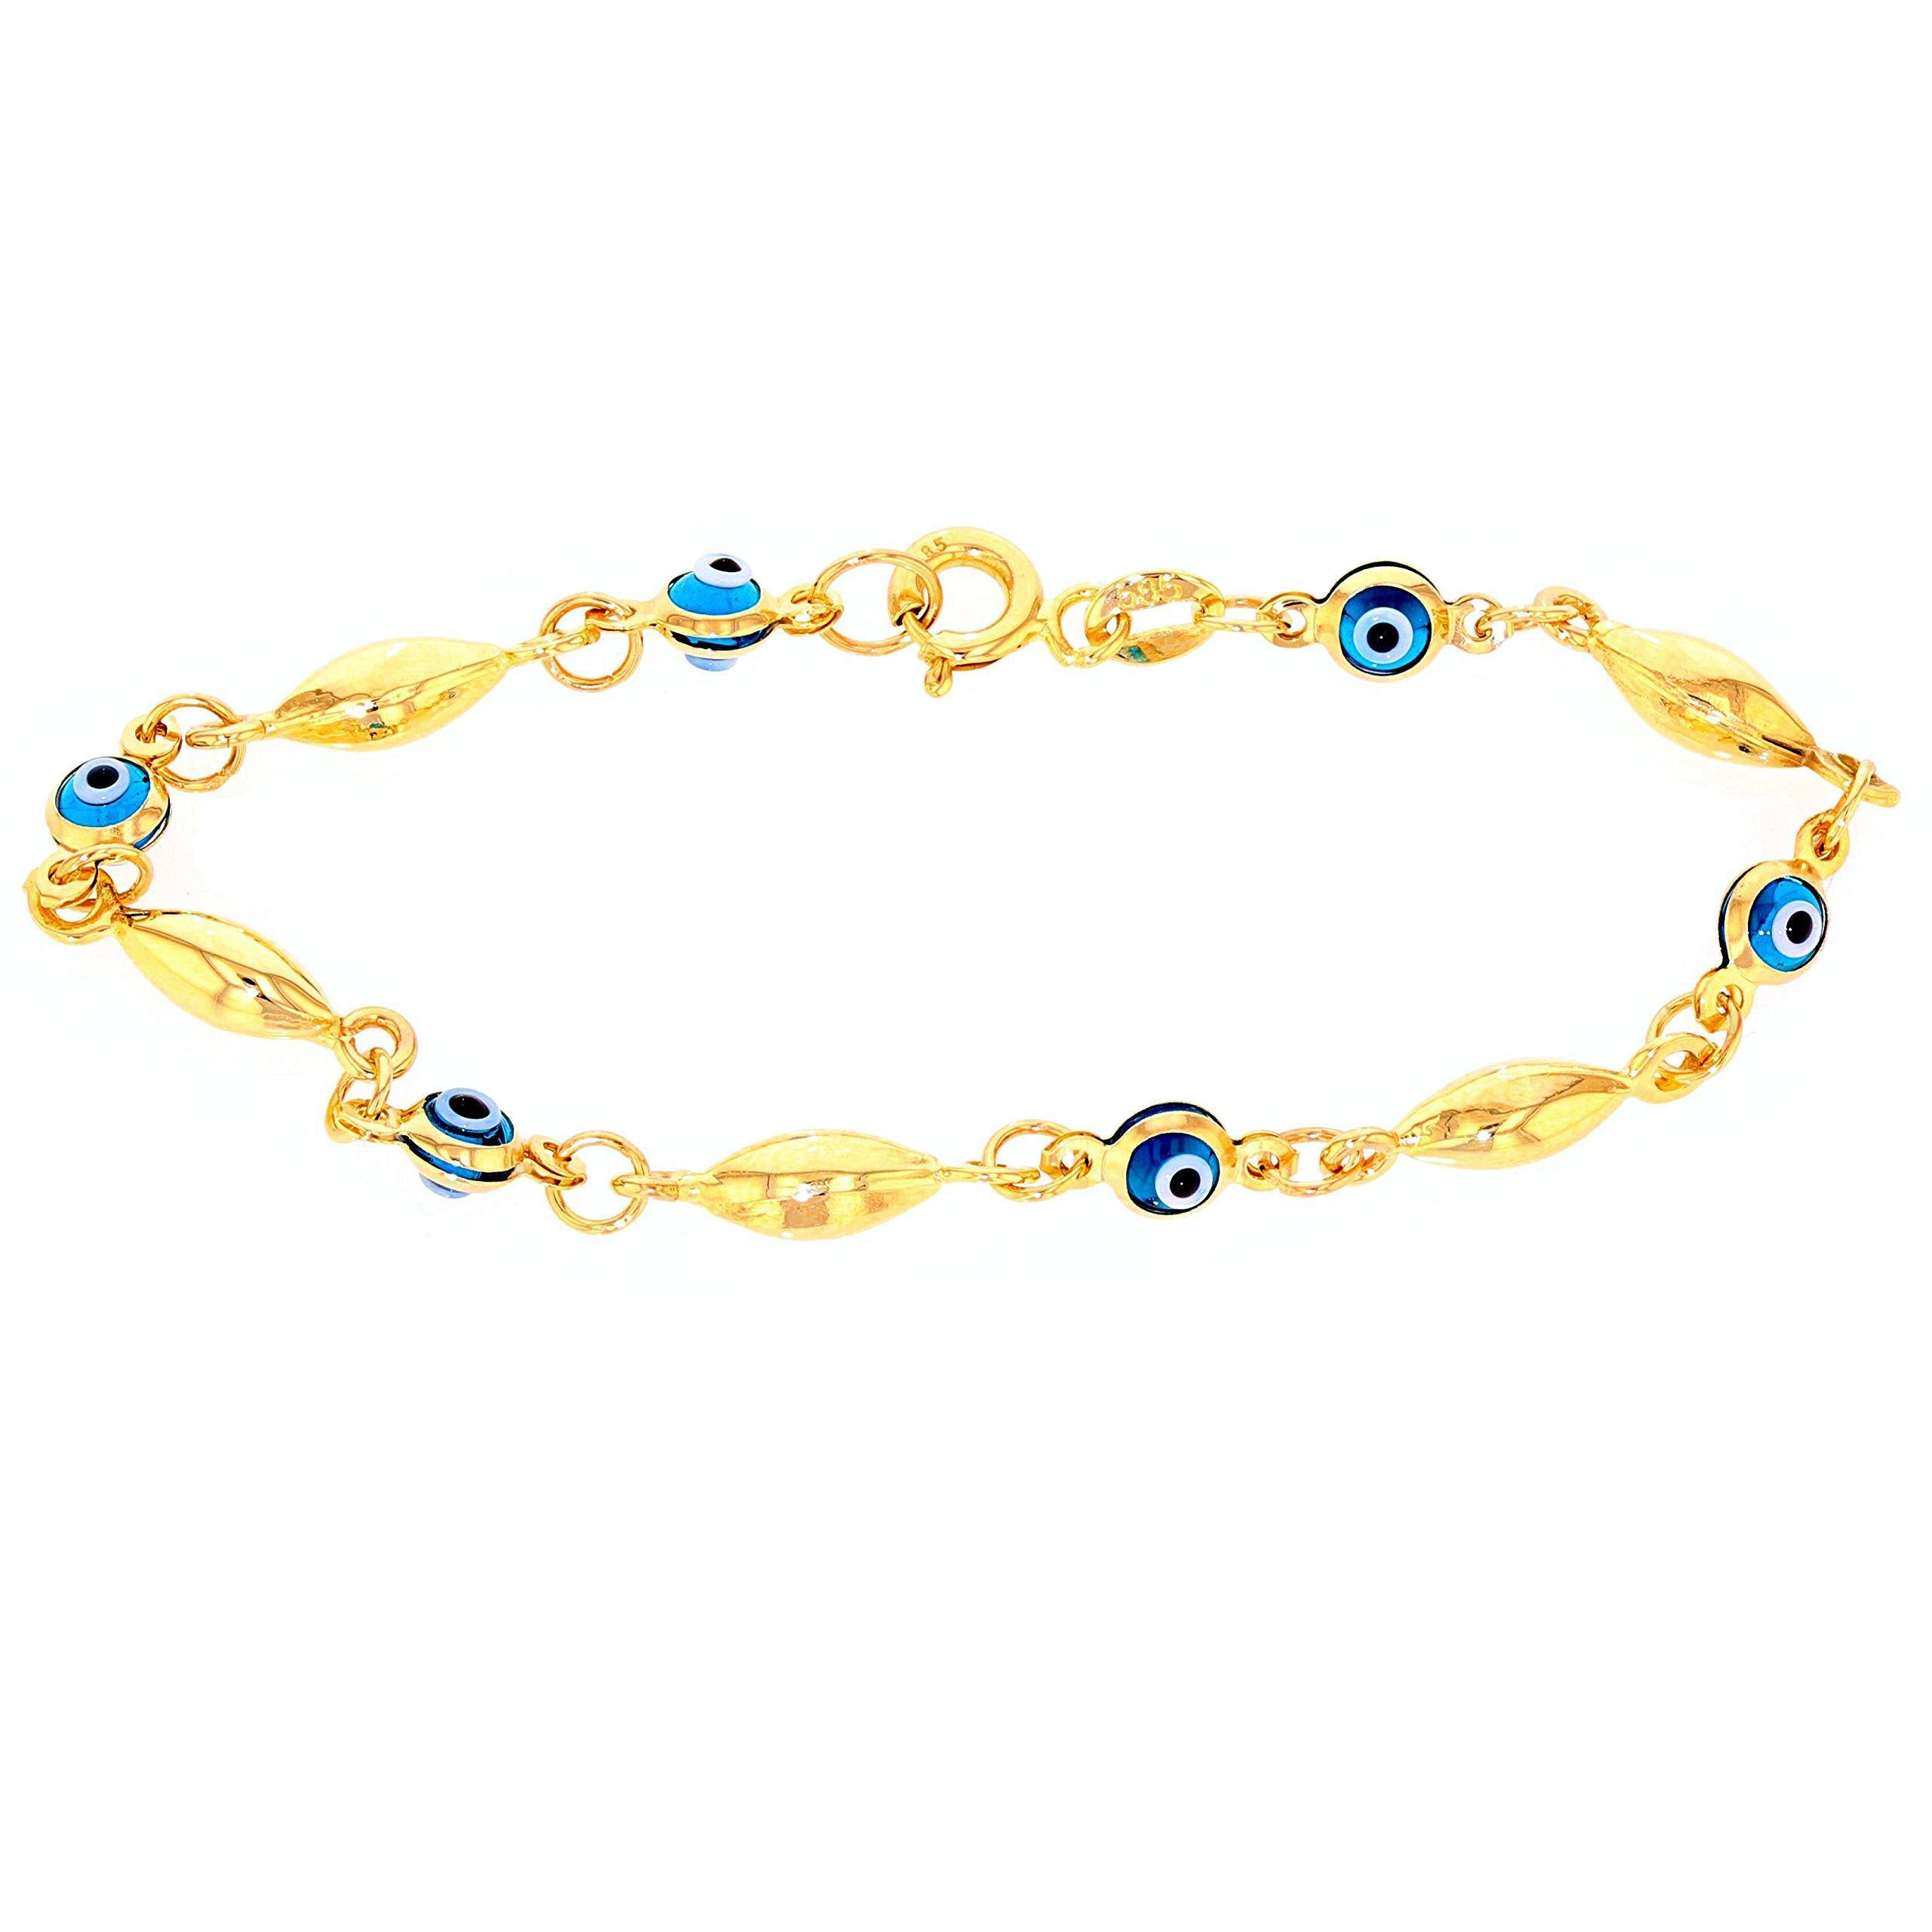 Solid 14k Yellow Gold Blue Evil Eye Baby Bracelet 5.5'' by Evil Eye by Jewelry America